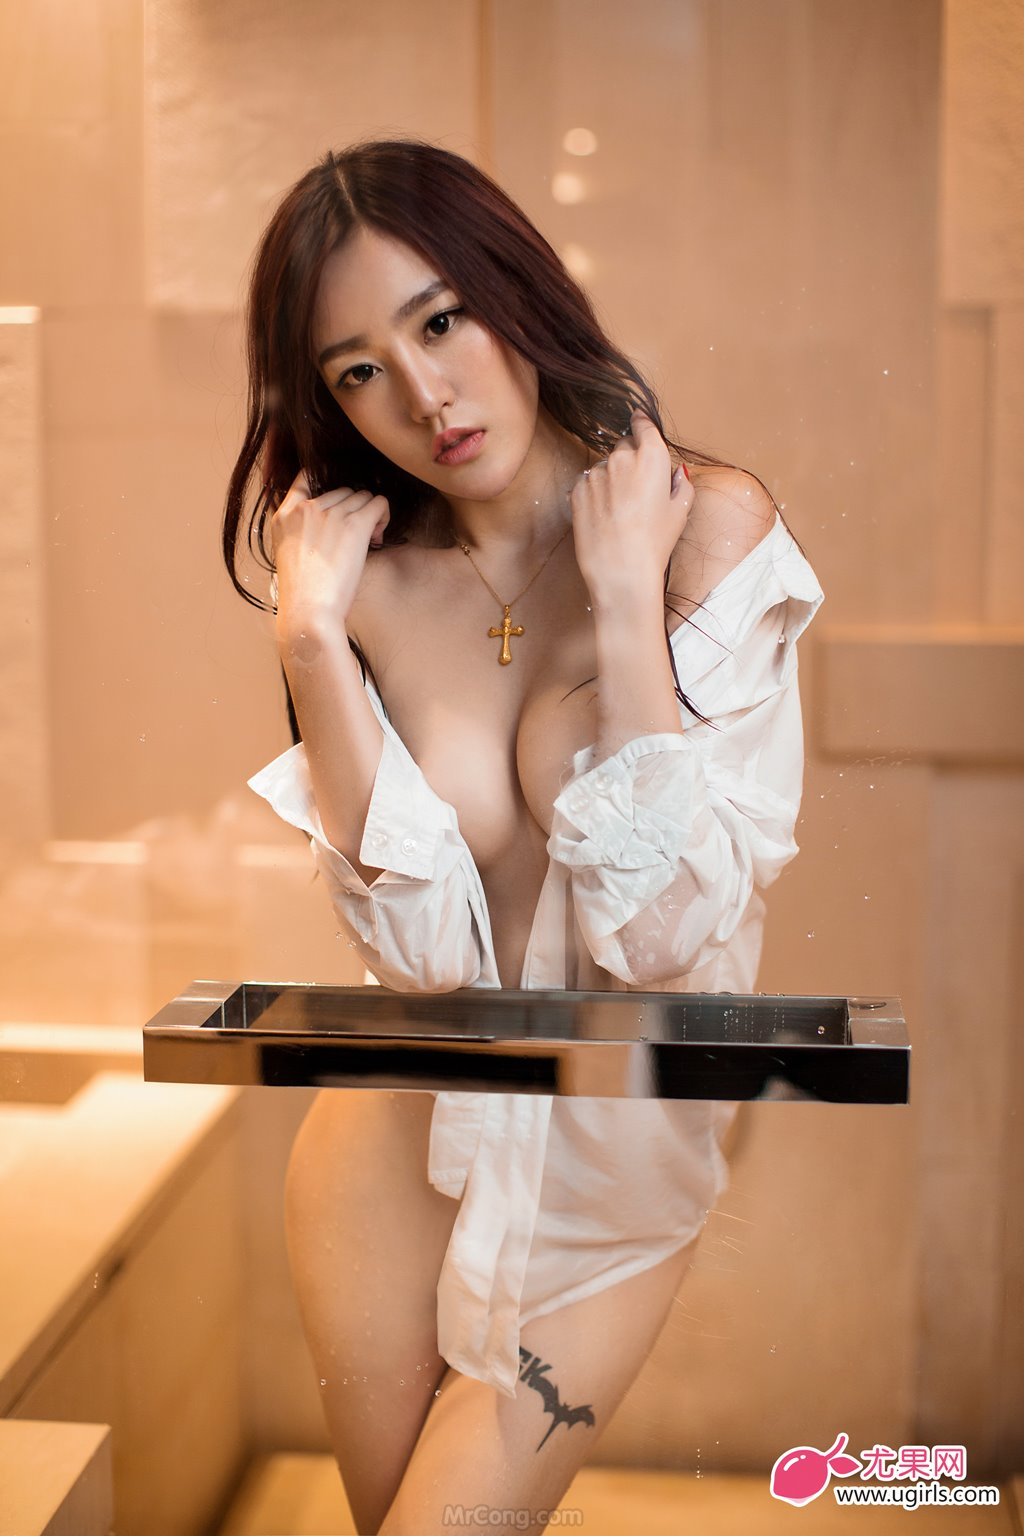 Image MrCong.com-UGIRLS-026-Guo-Wan-Qi-033 in post Người đẹp Guo Wan Qi (郭婉祈) gợi cảm trong bộ ảnh UGIRLS 026